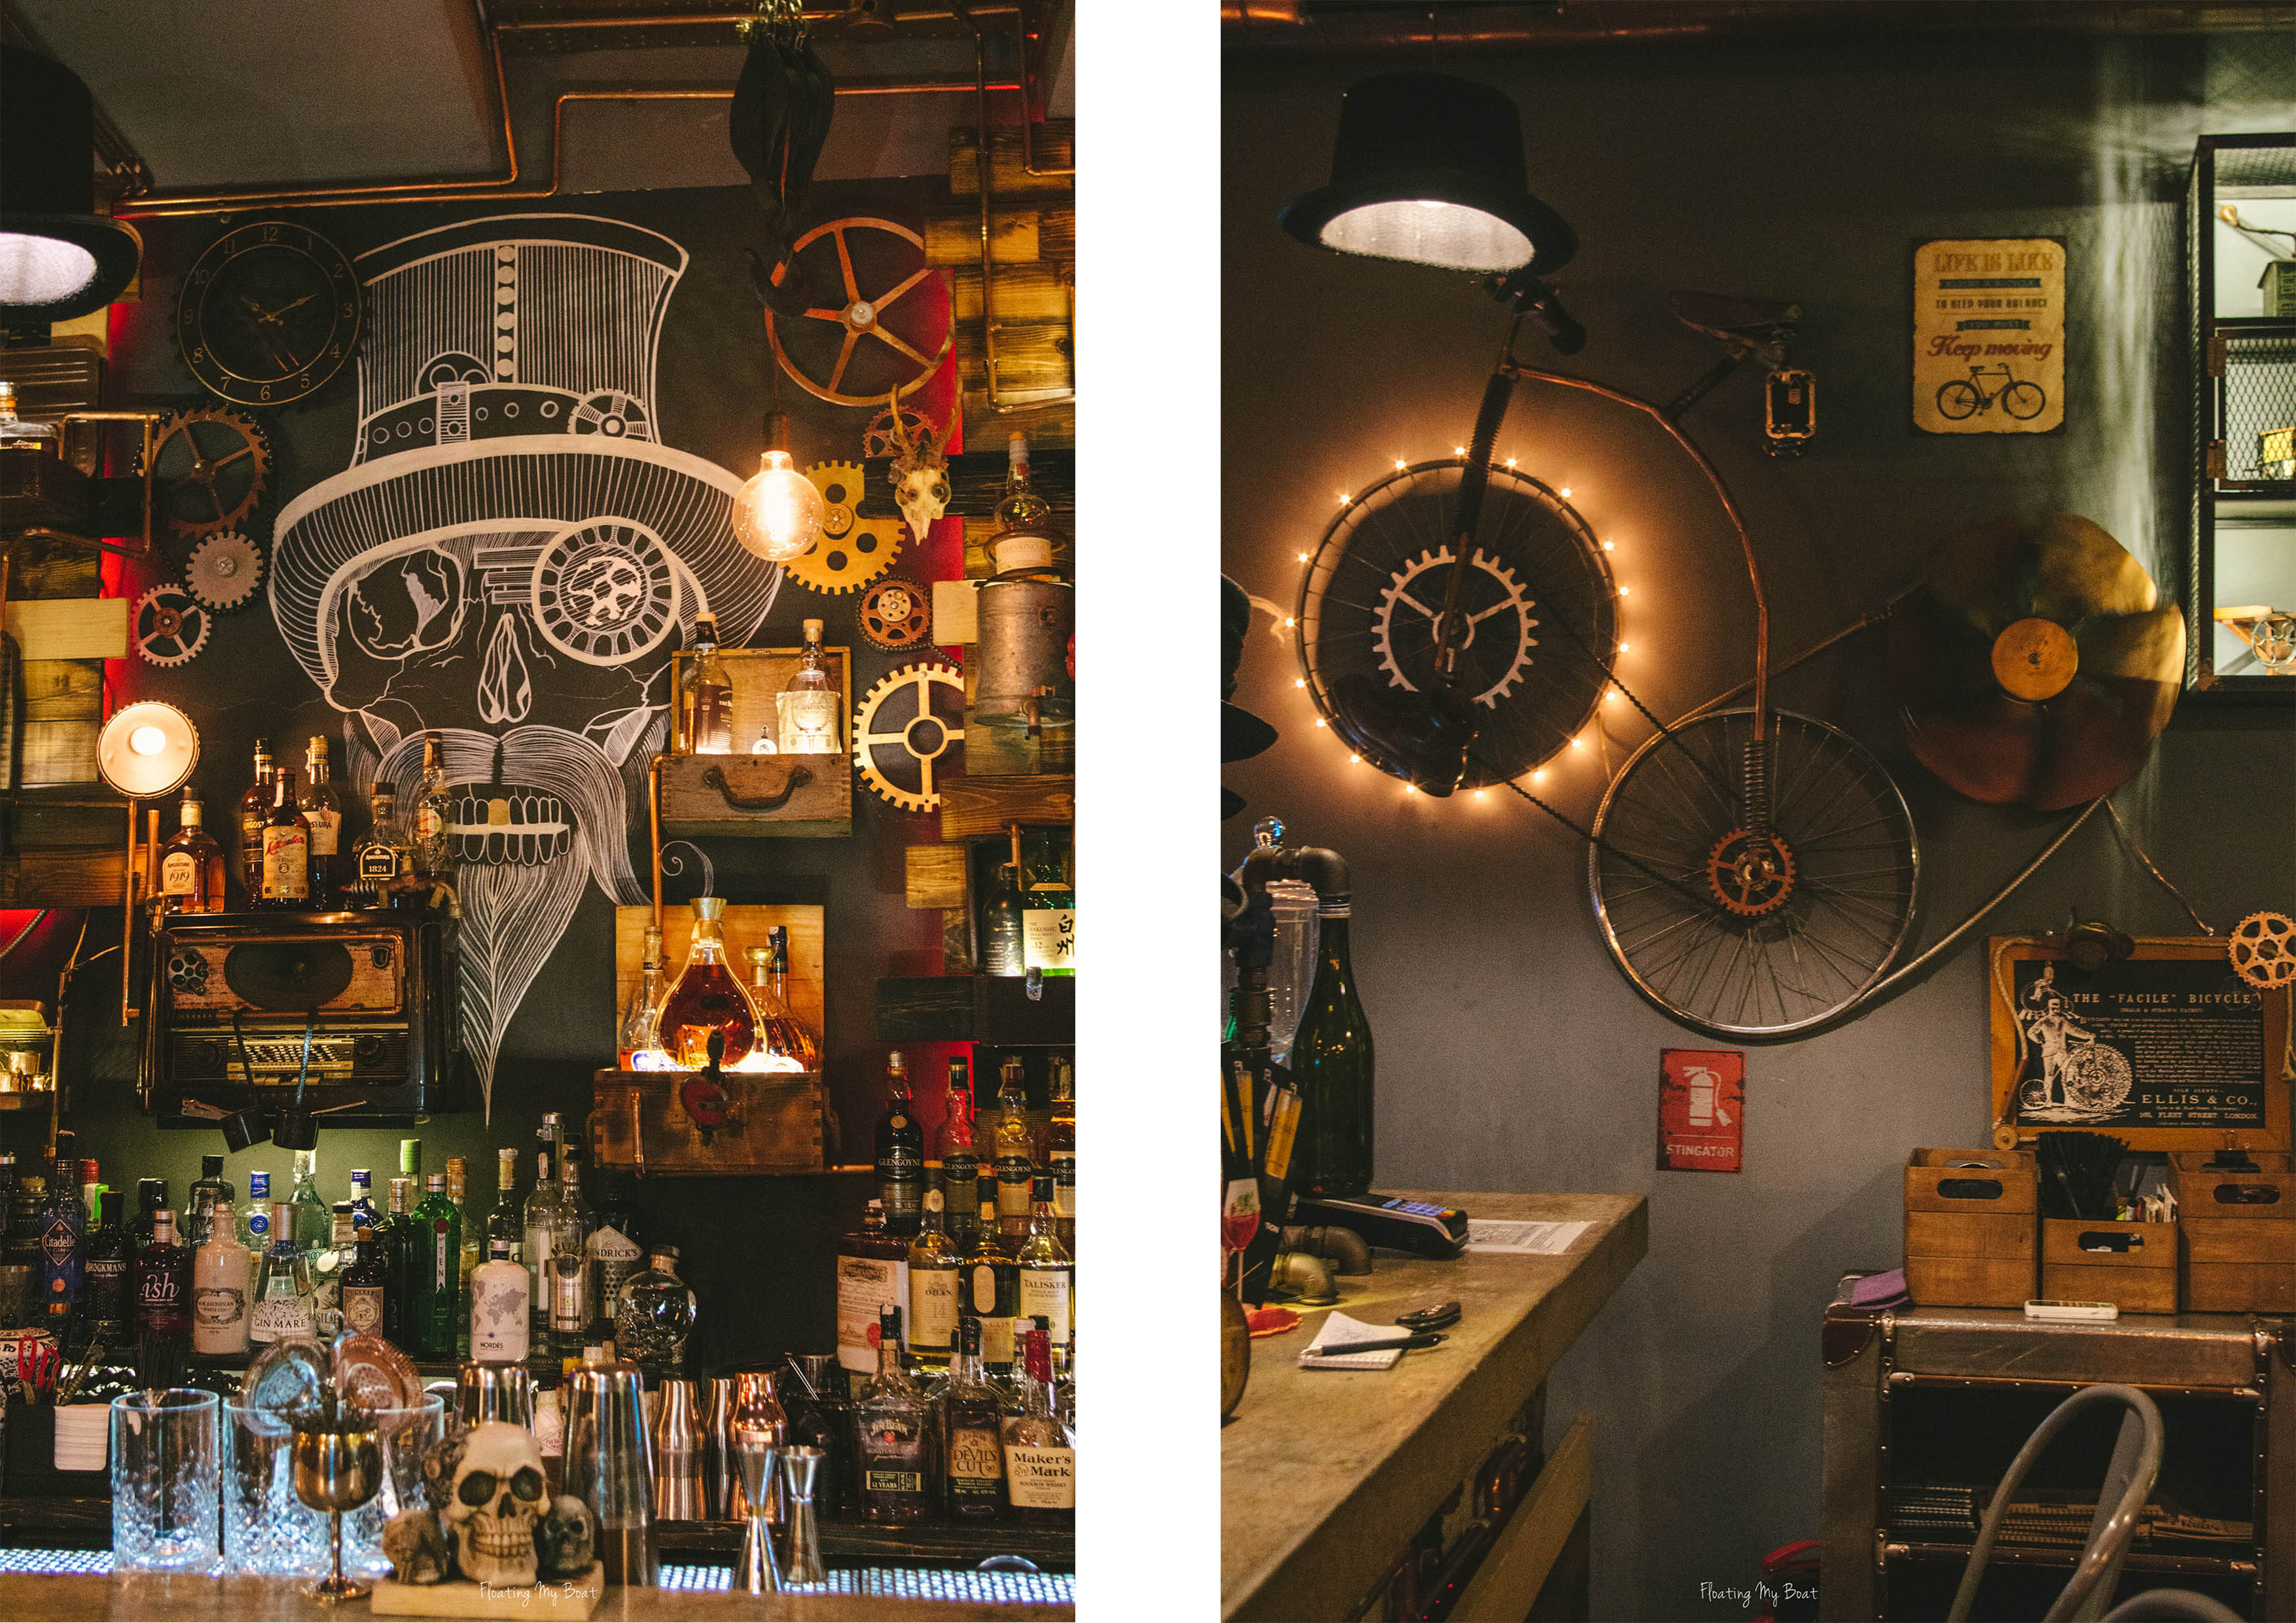 joben-bistro-steampunk-best-cafes-cluj-napoka